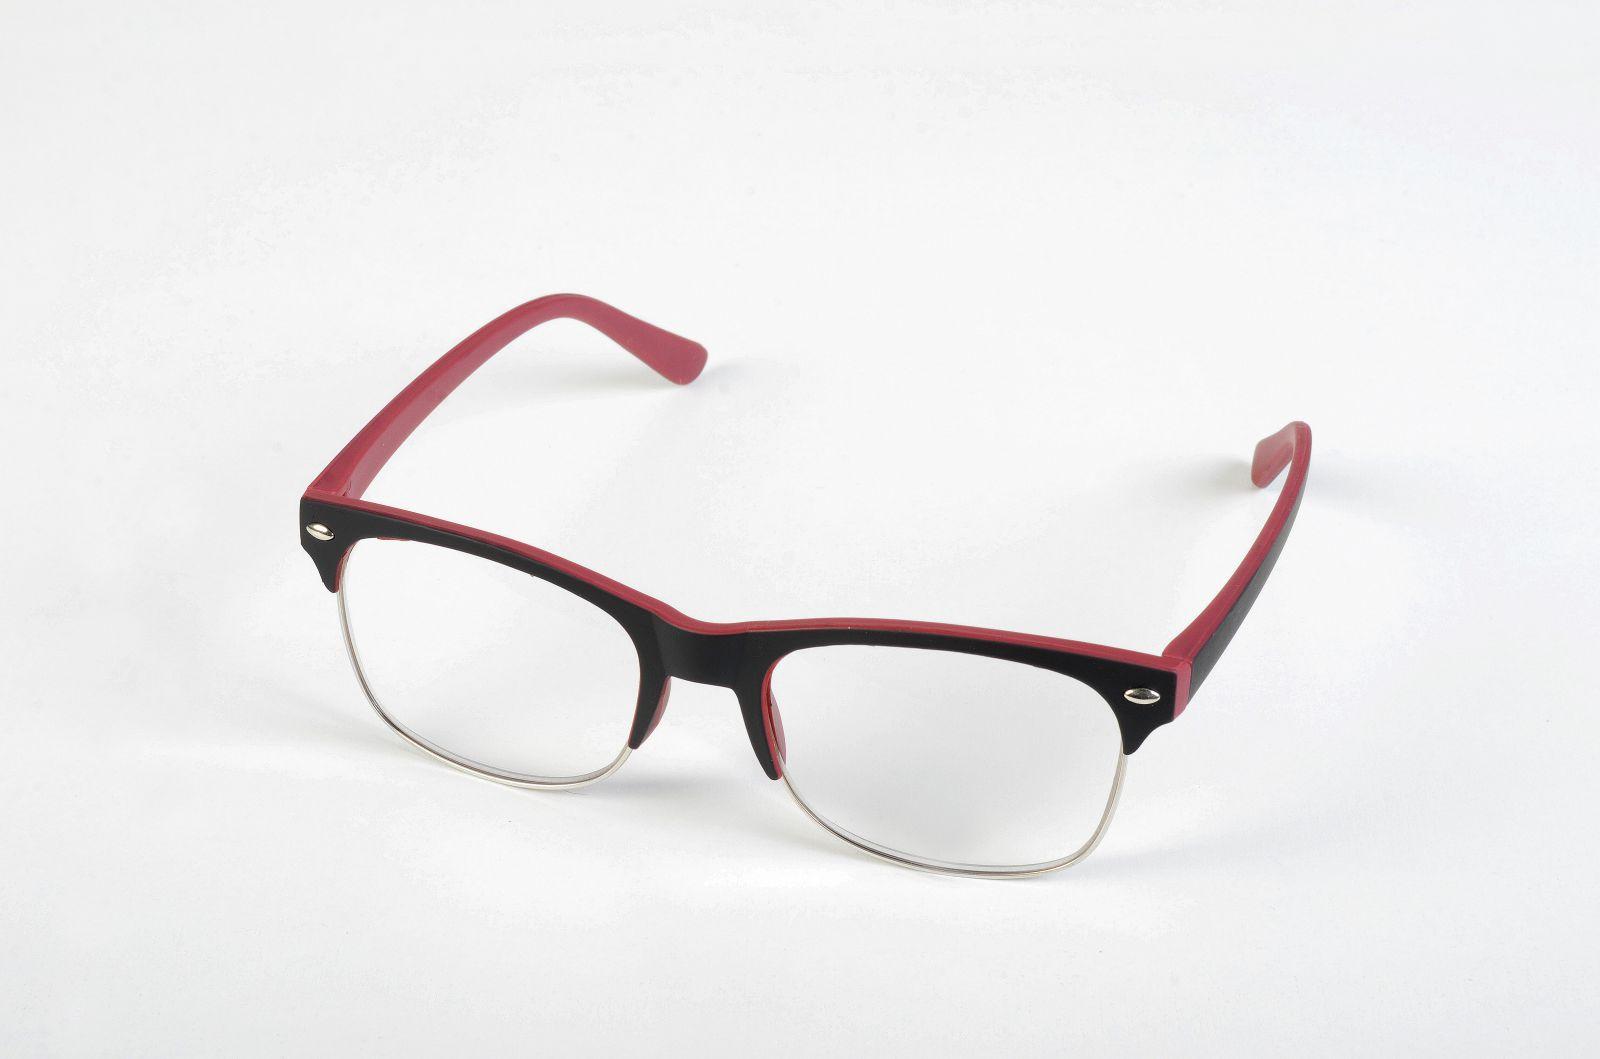 Dioptrické brýle 820153 +1,50 E-batoh